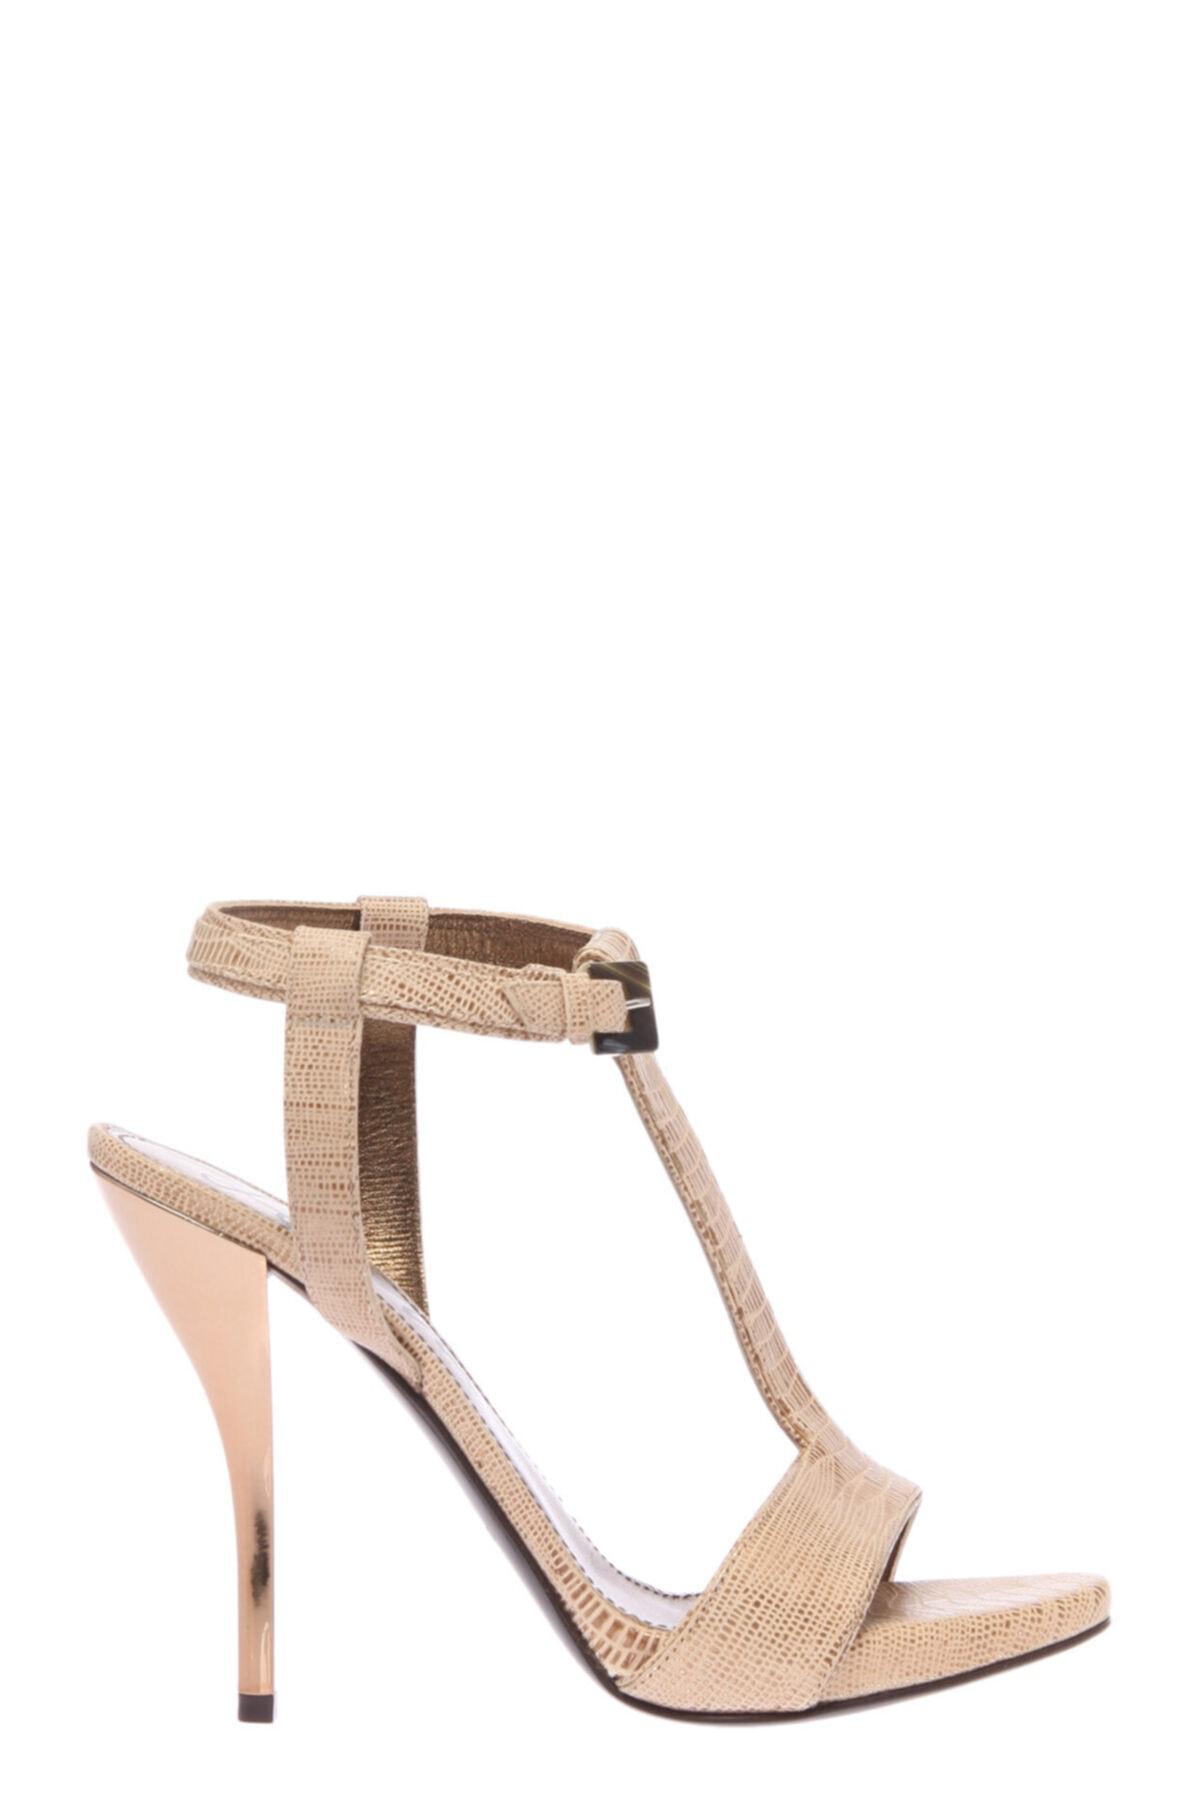 Lanvin Sandalet 1